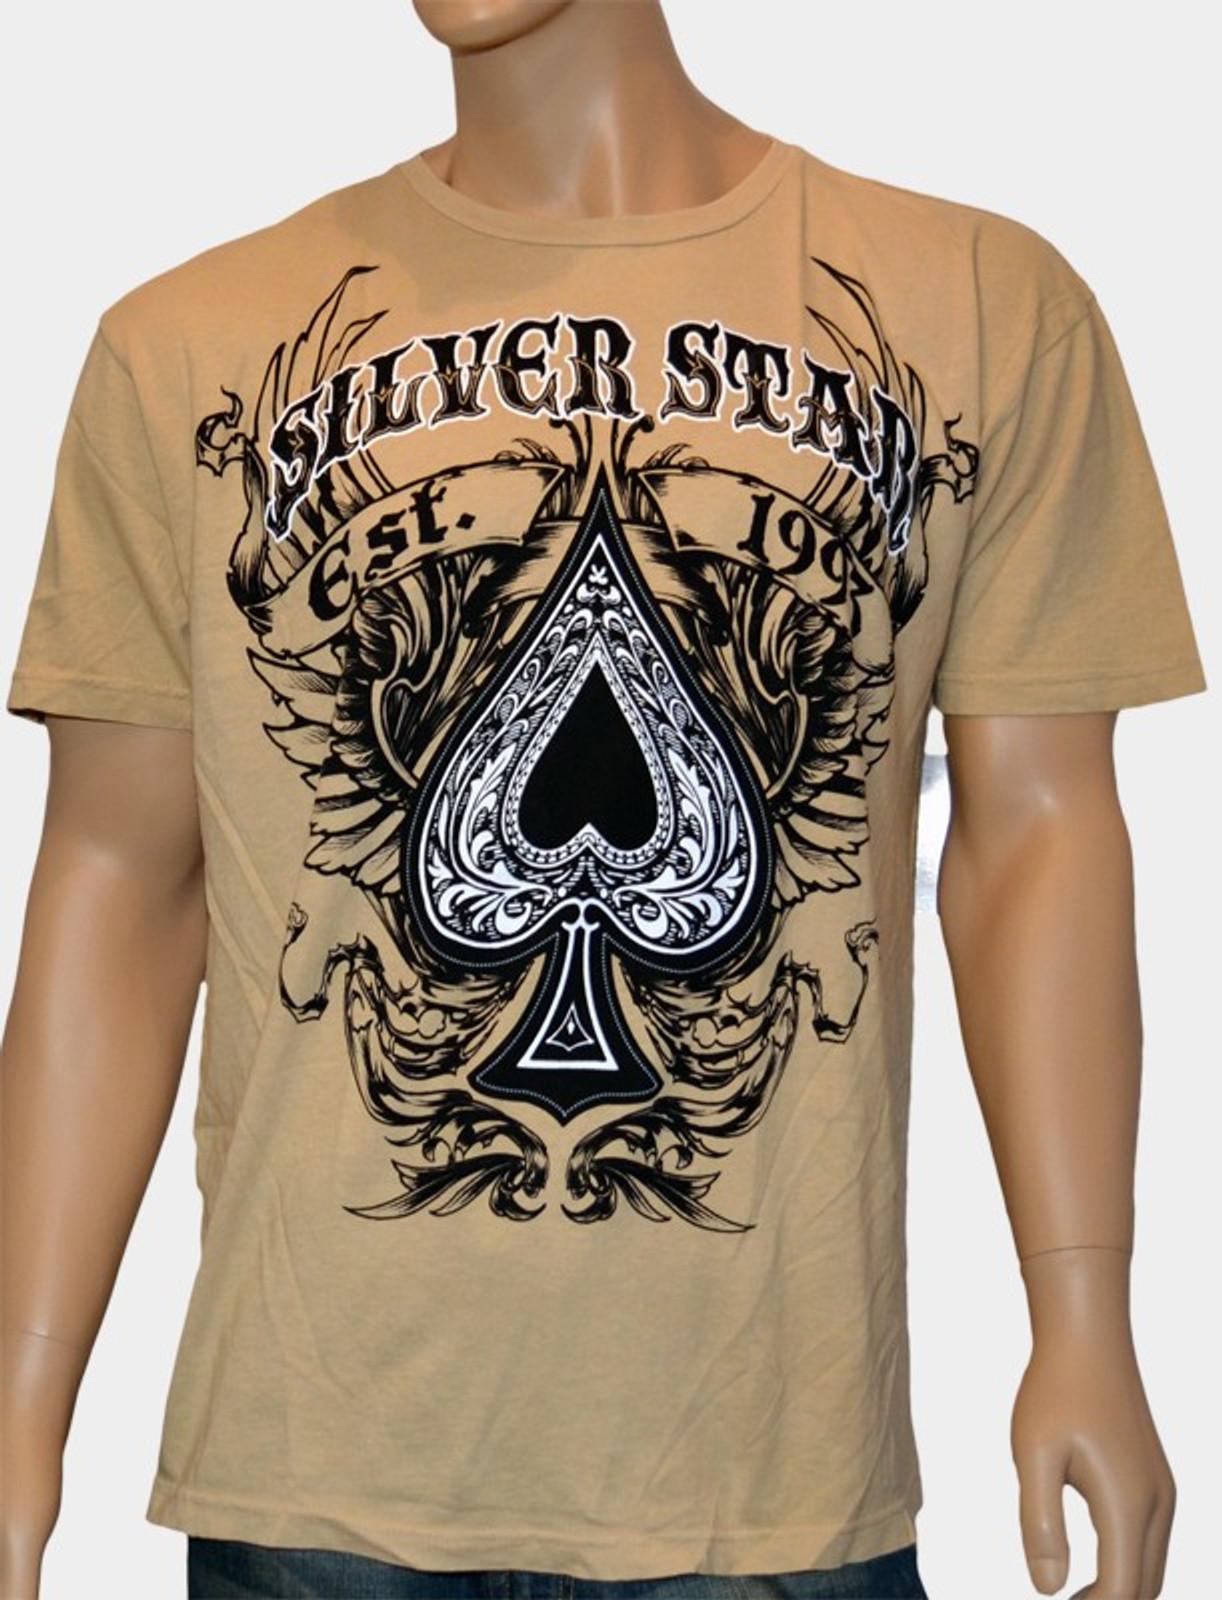 Silver Star T-Shirt Spaded